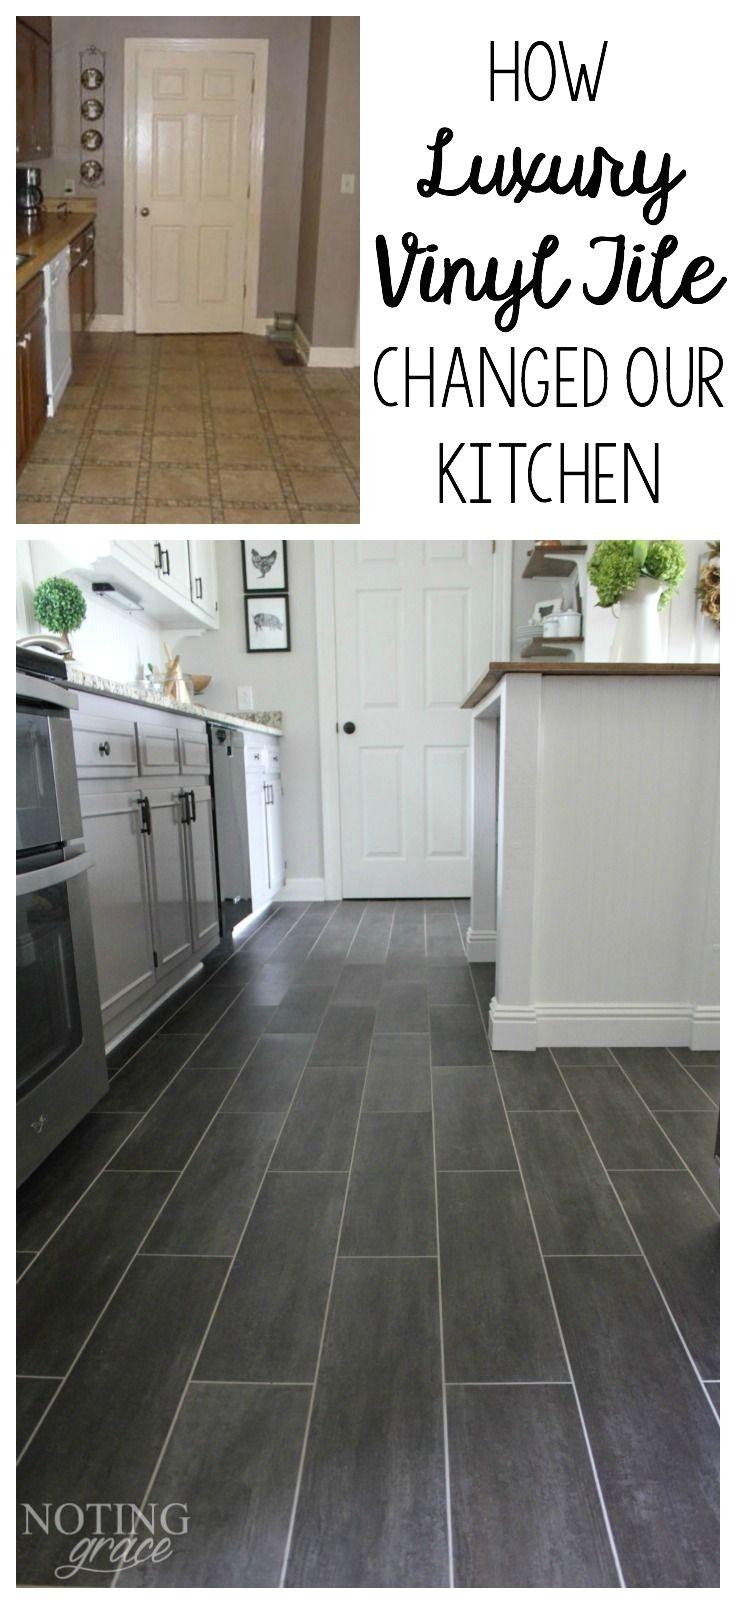 diy kitchen flooring kitchen ideas pinterest luxury vinyl tile vinyl tiles and luxury vinyl